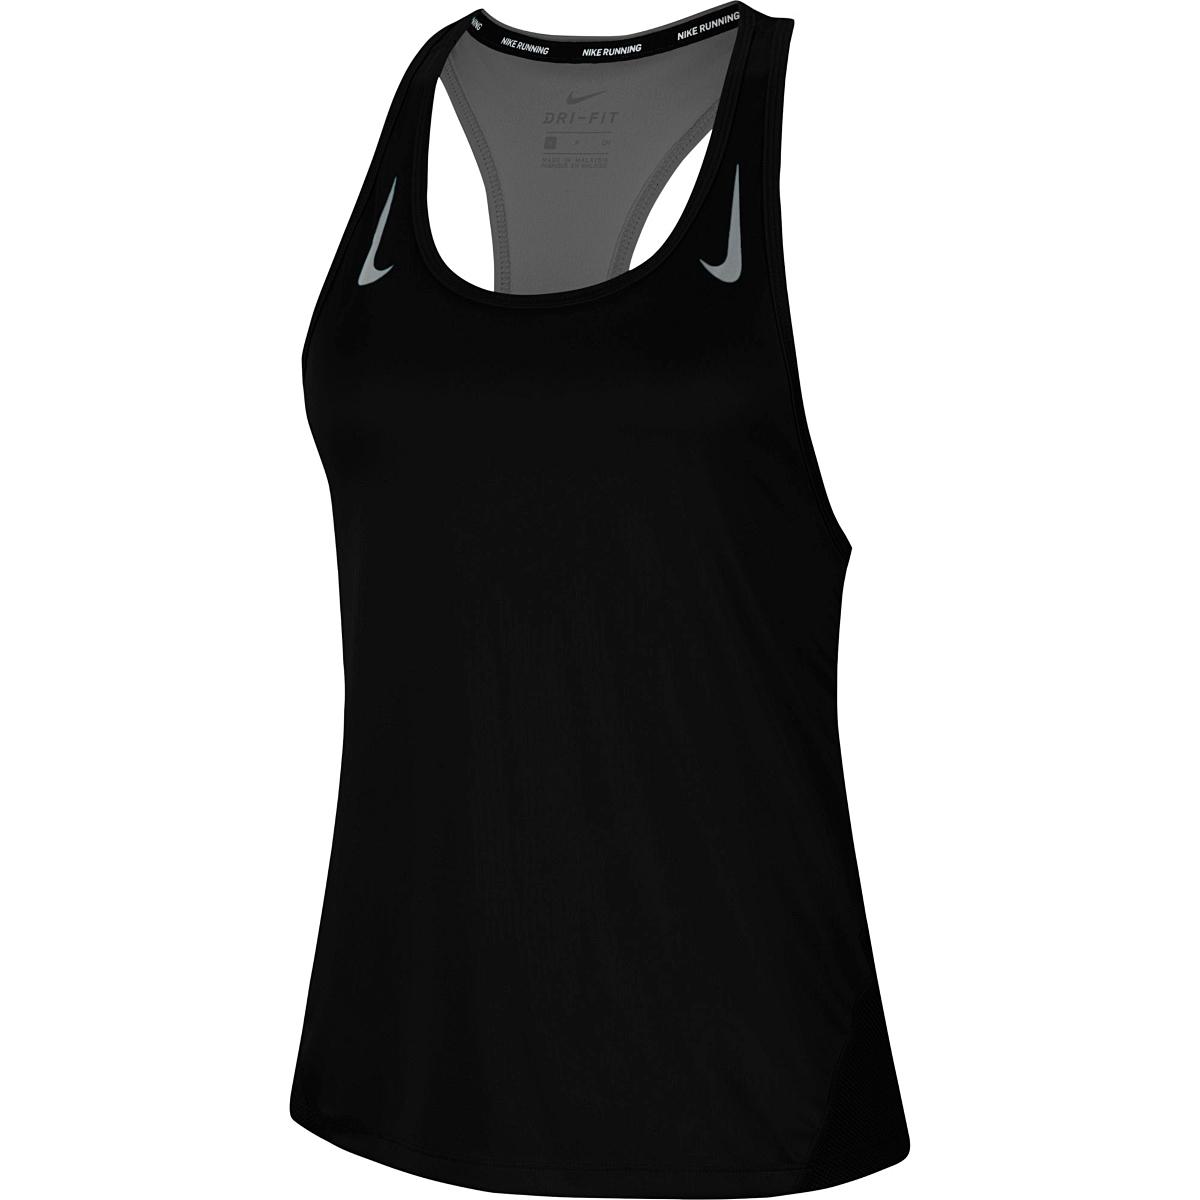 Women's Nike Miler Women's Running Singlet - Color: Black/Reflective - Size: S, Black/Reflective, large, image 1